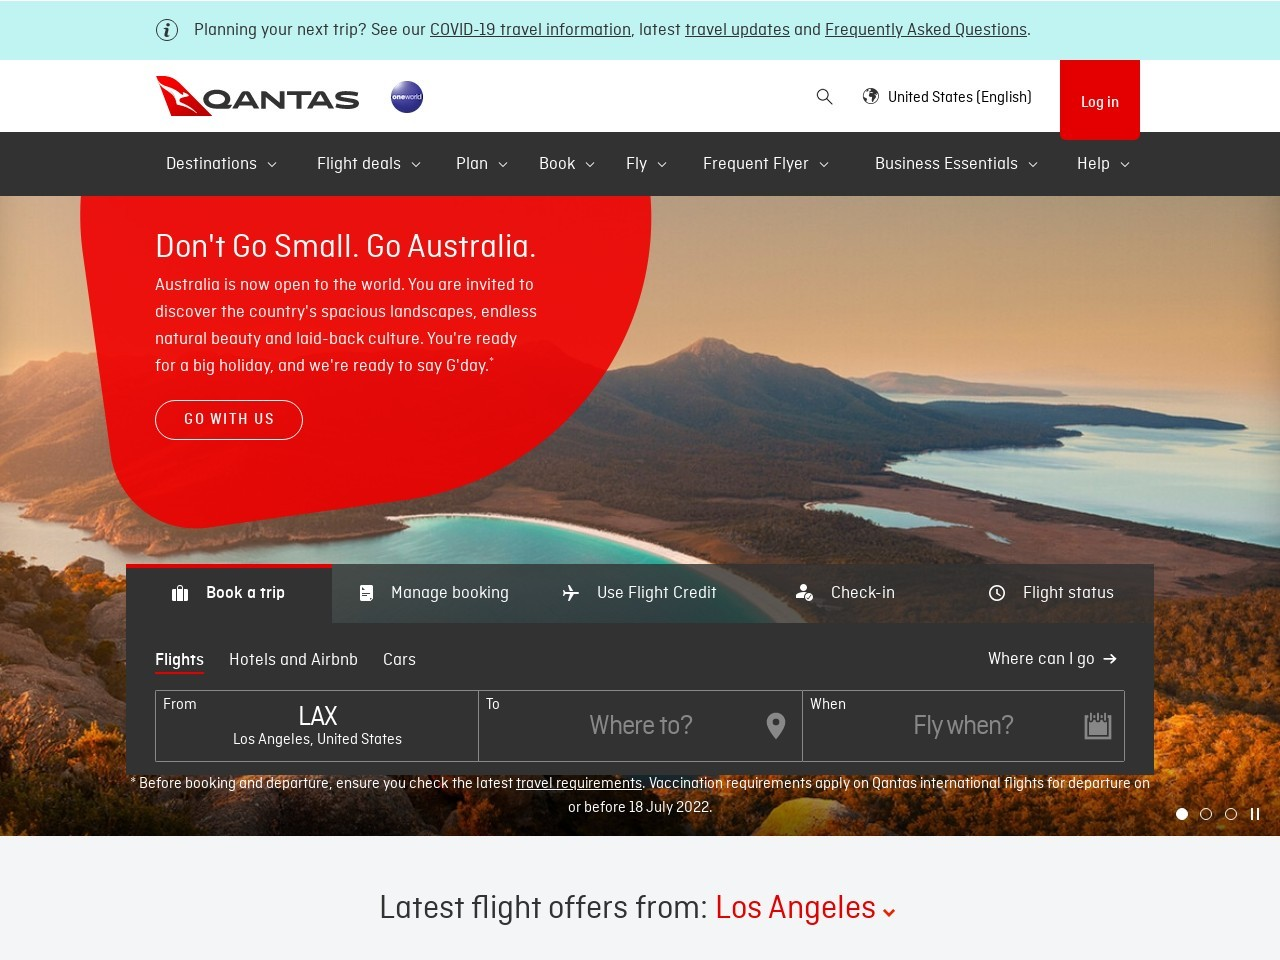 http://qantas.com.au/travel/airlines/visa-health/global/en